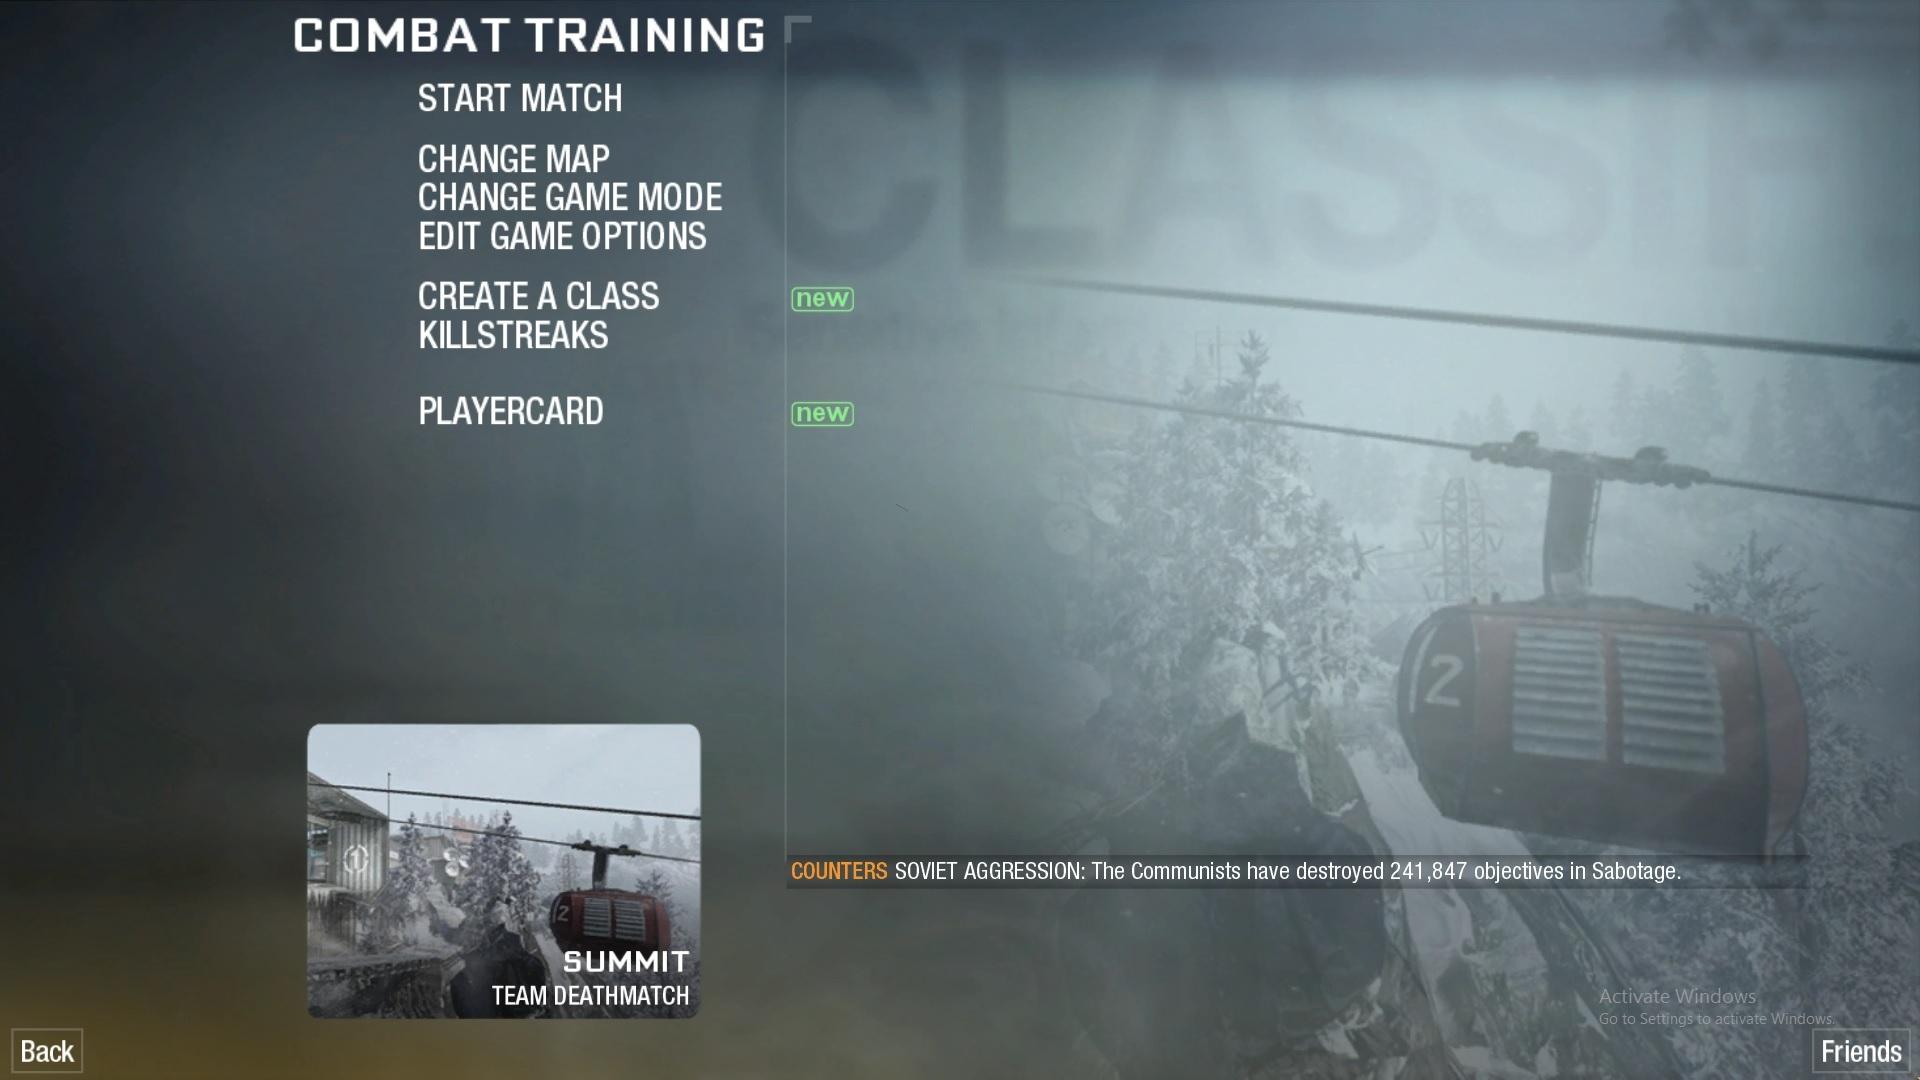 Combat Training | Call of Duty Wiki | FANDOM powered by Wikia